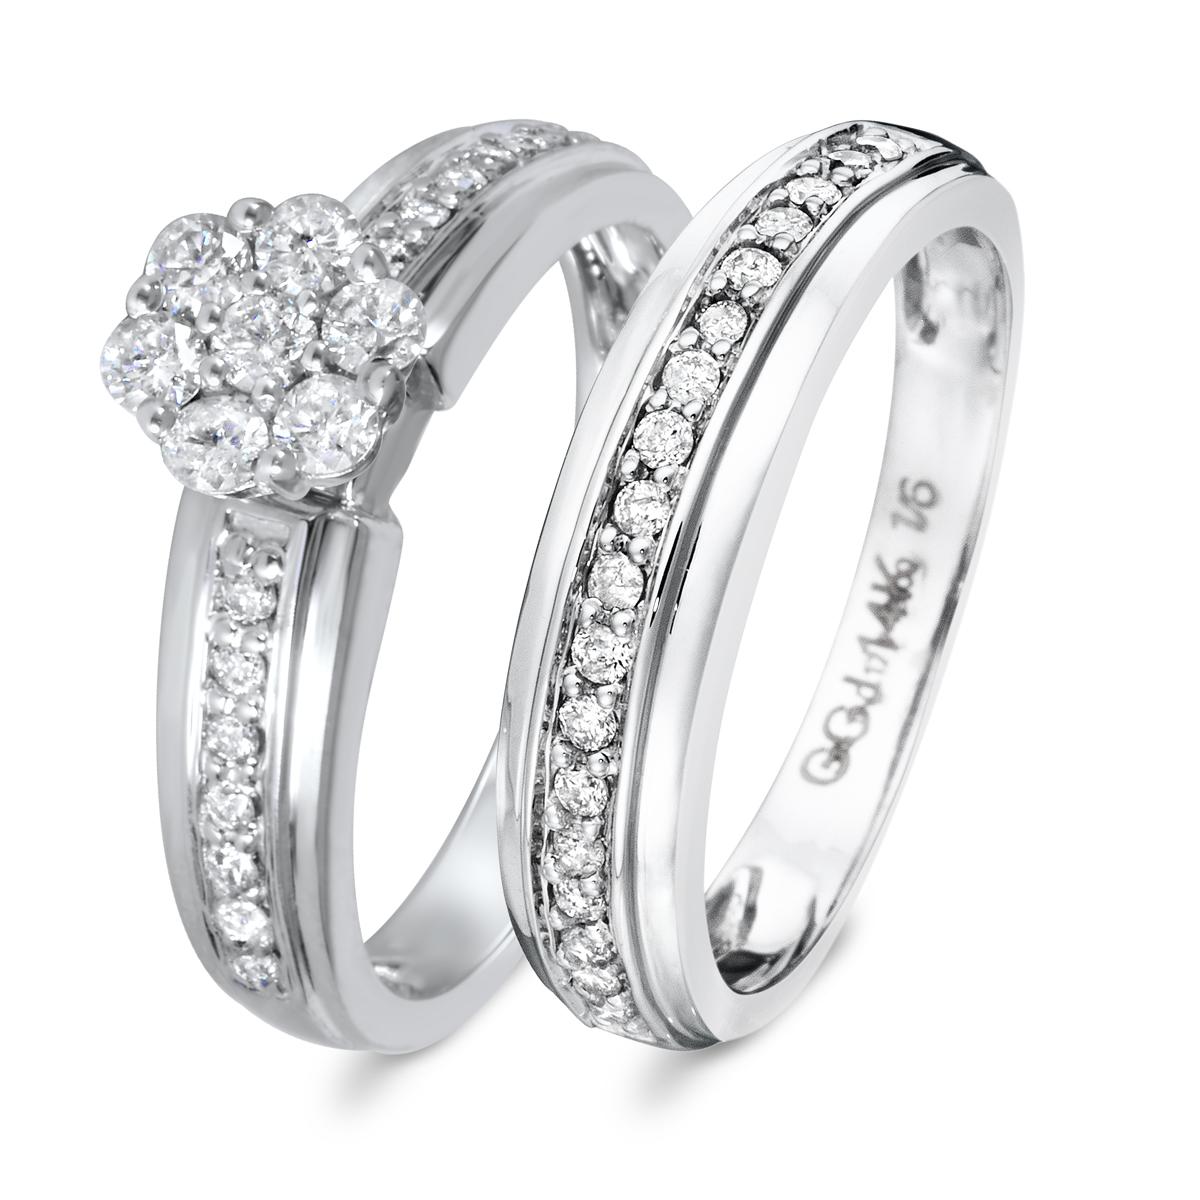 2/3 CT. T.W. Diamond Women's Bridal Wedding Ring Set 14K White Gold